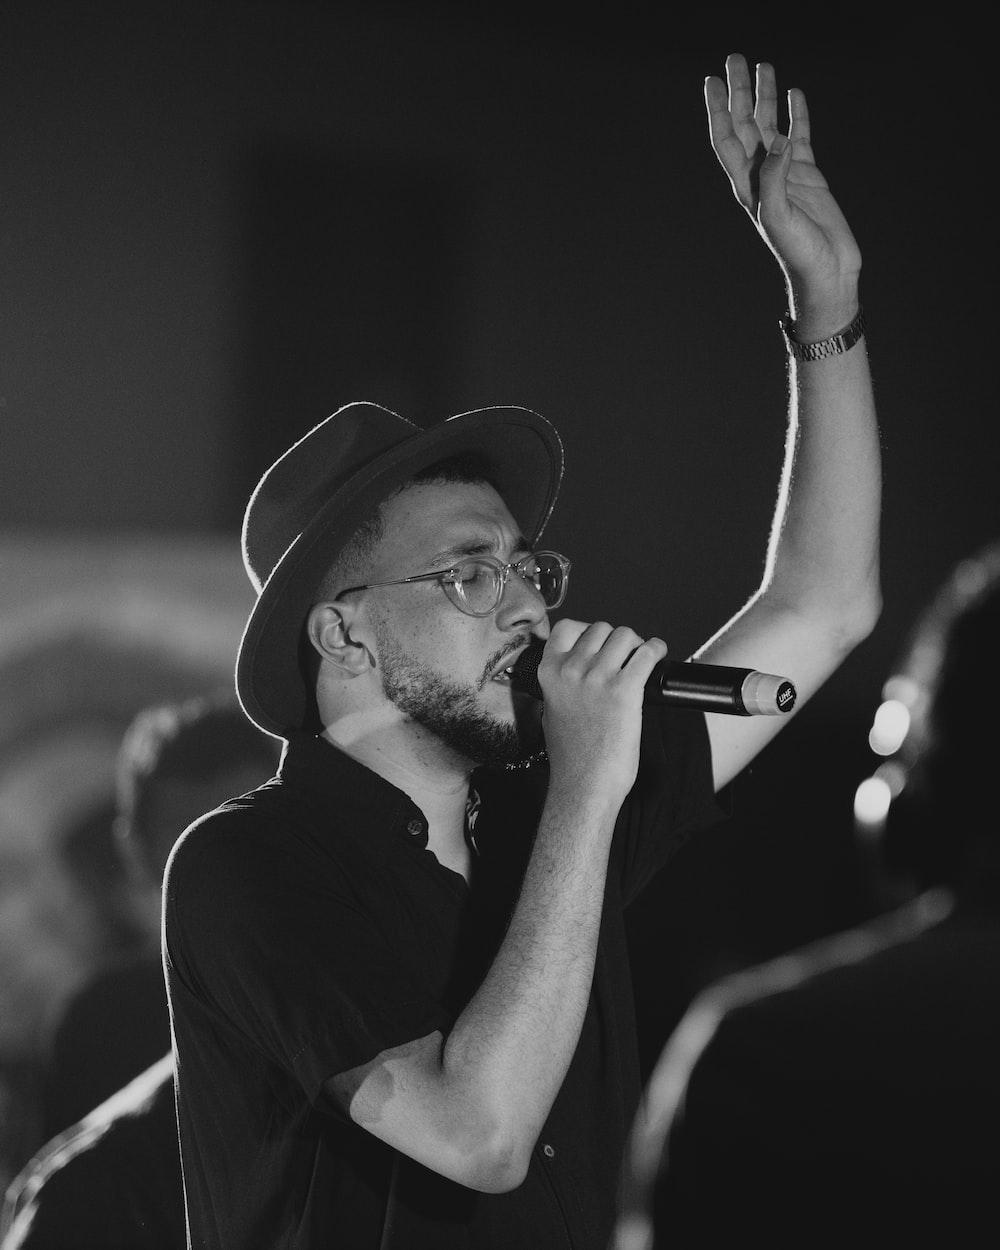 man in black hat holding smartphone